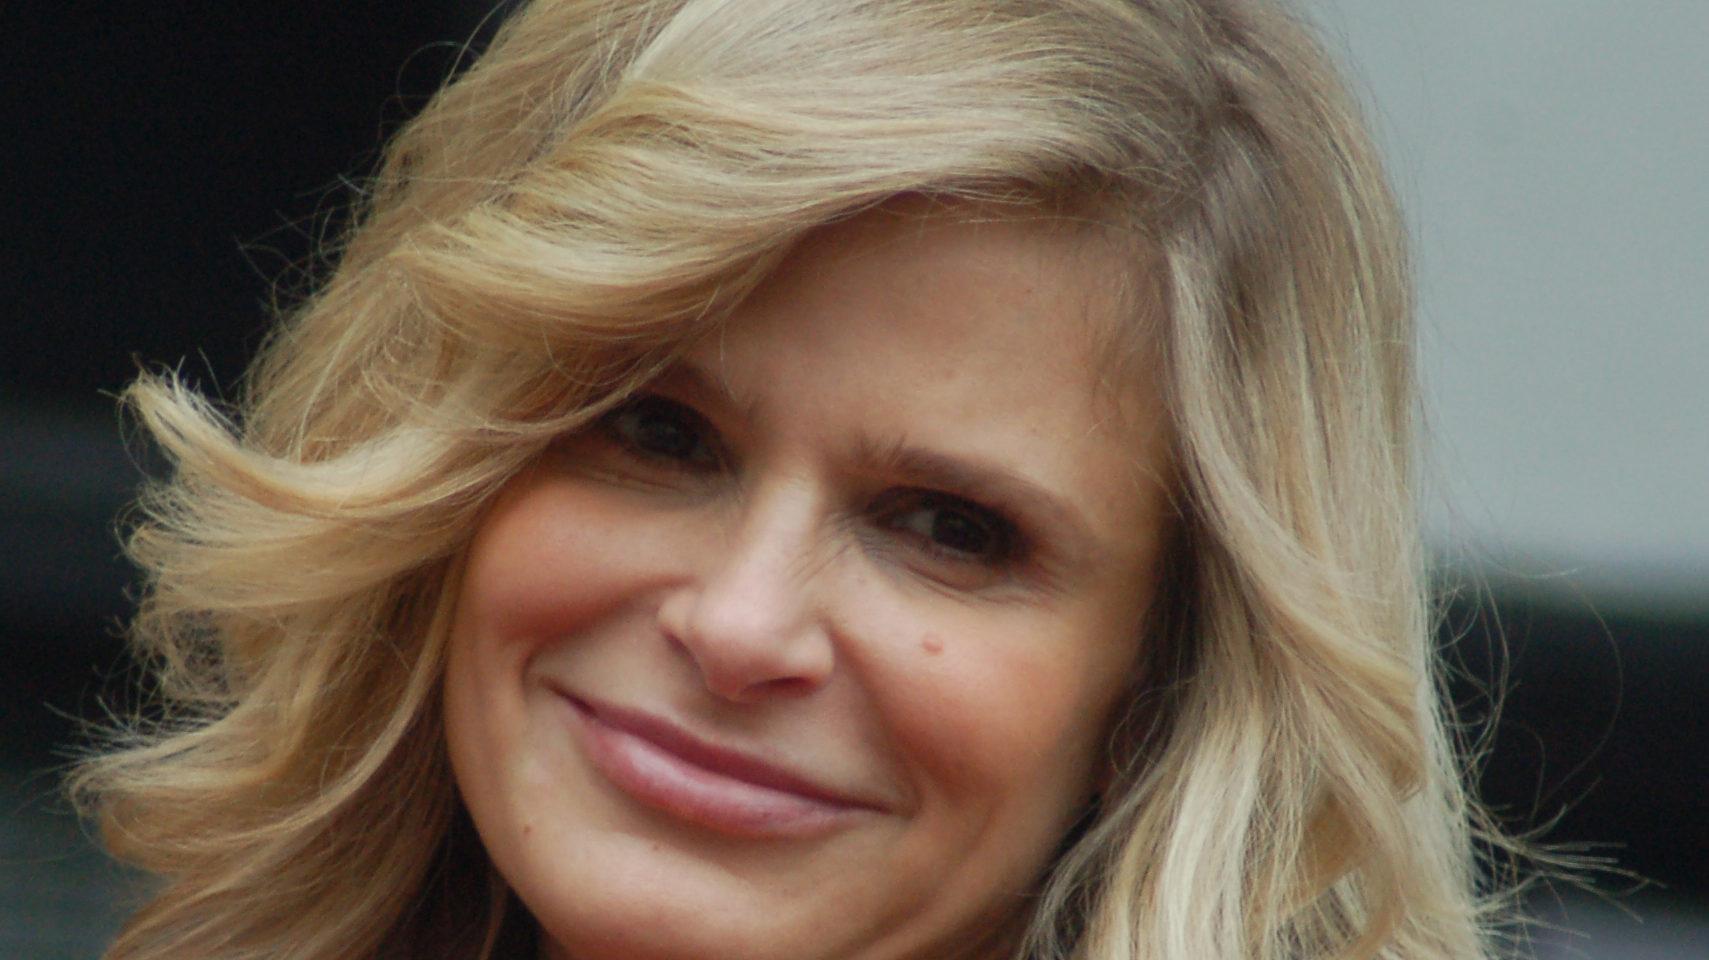 Kyra Sedgwick to direct supernatural love story